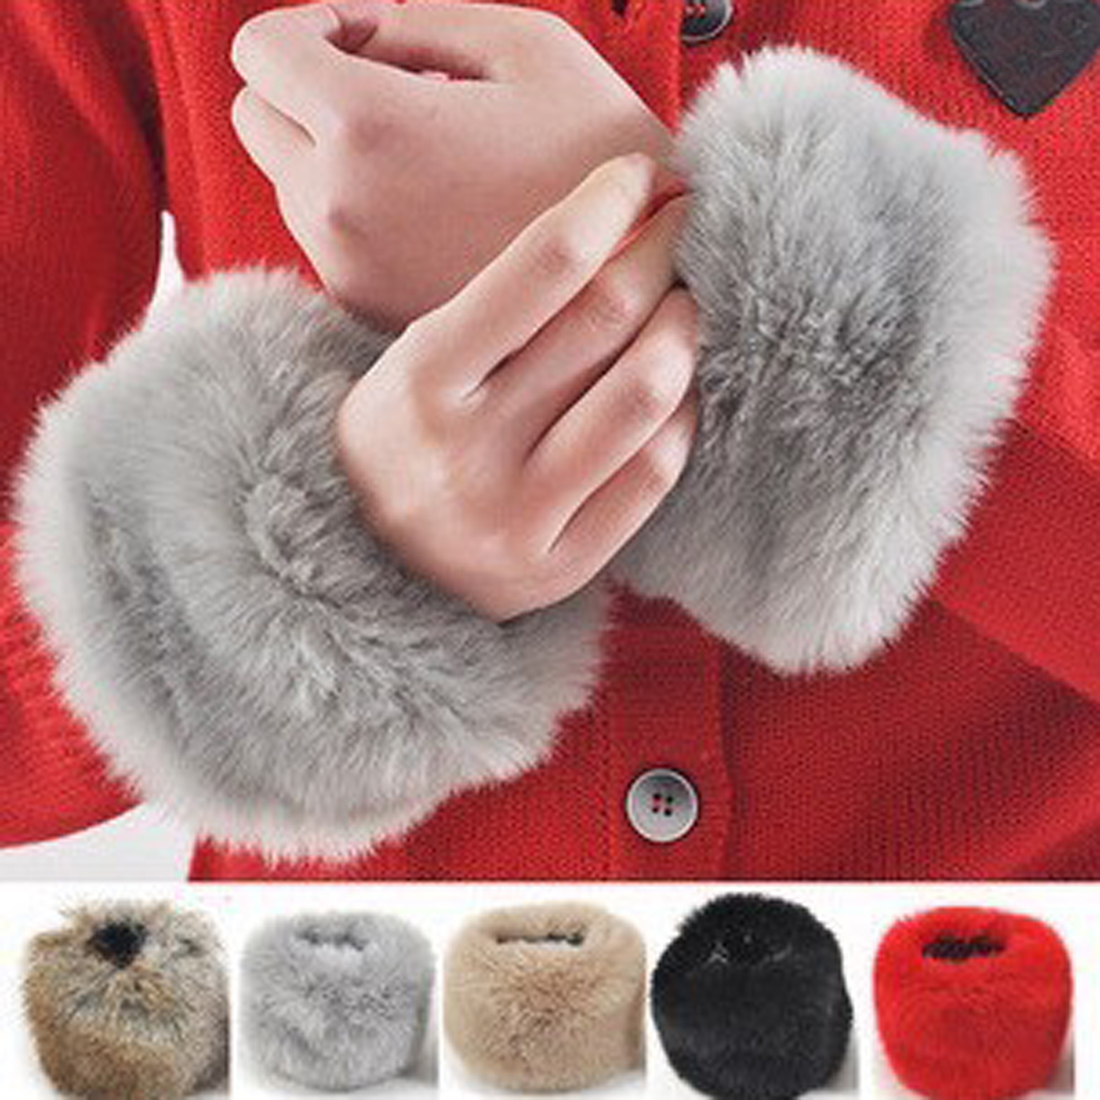 New Arrive Winter Warm Women Arm Warmer Faux Fur Soft Elastic Wrist Slap On Cuffs Arm Warmer Plush Thicken Accessories Gray Gray